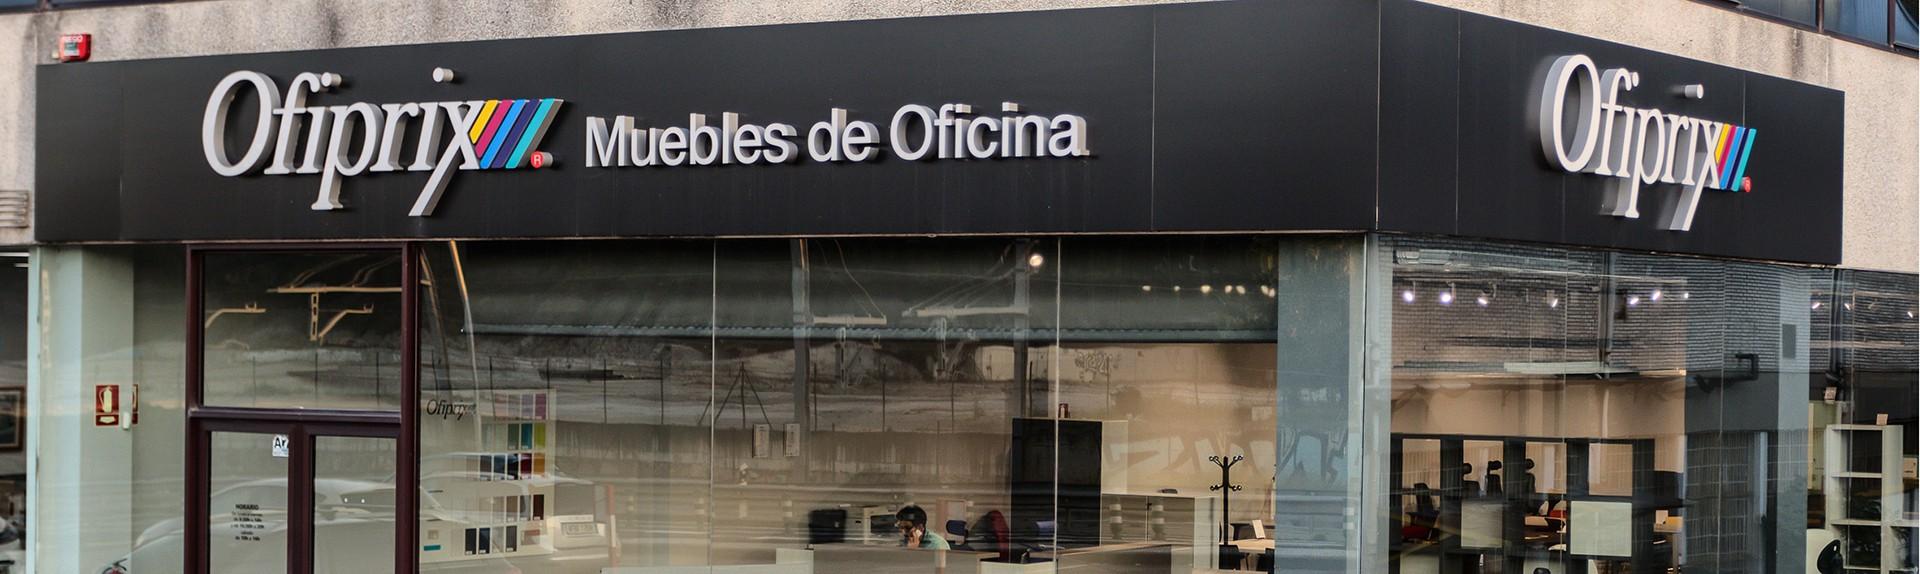 Tienda Ofiprix de Zaragoza